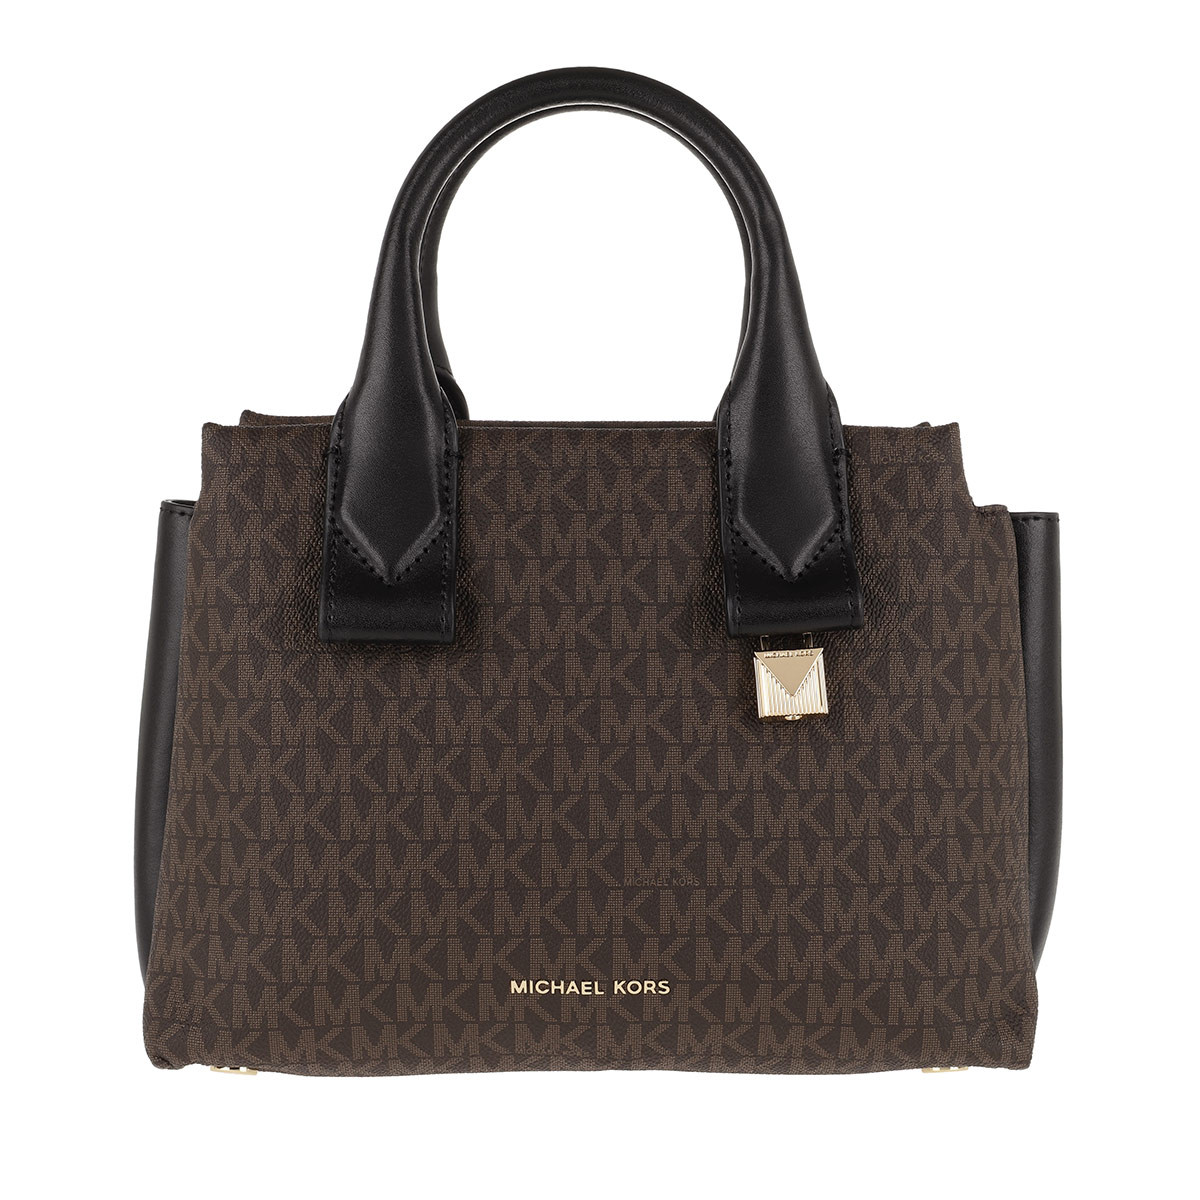 Michael Kors Satchel Bag - Rollins SM Satchel Bag Brown/Black - in braun - für Damen